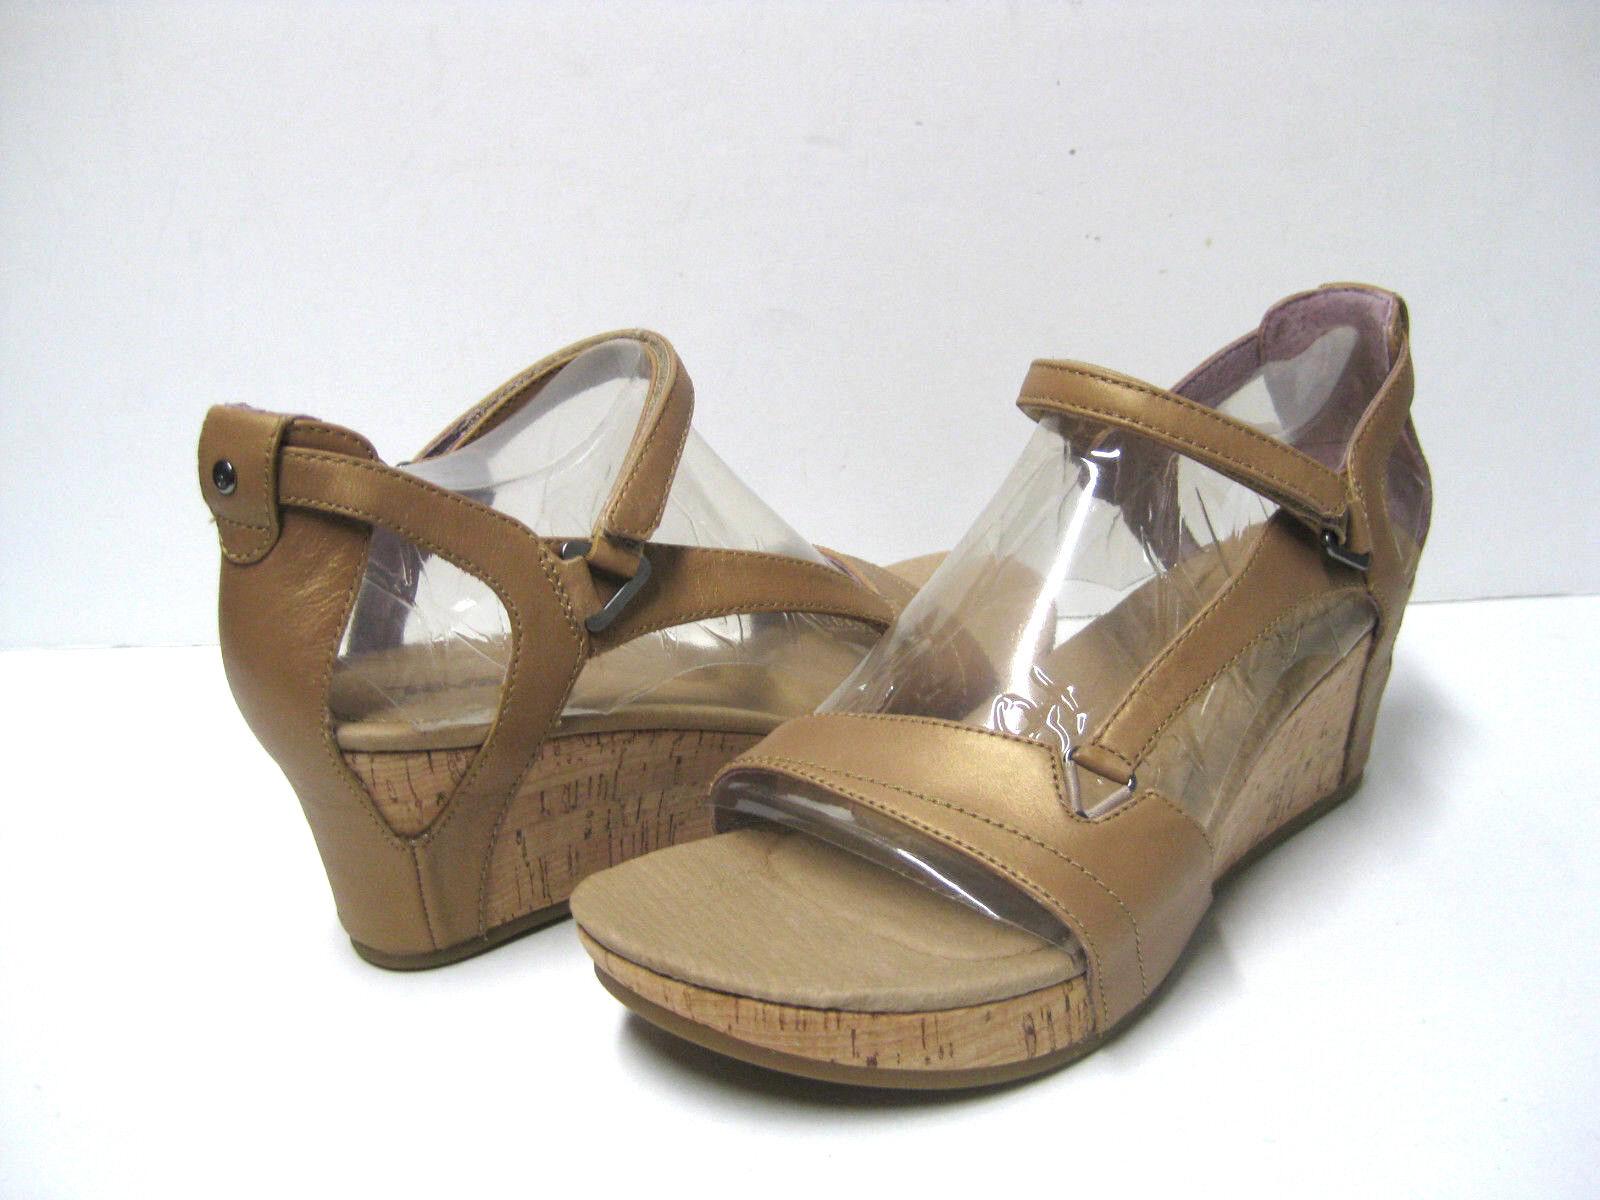 Teva Capri Wedge Pearlized Tan Sandals donna US 9 UK7 EU40